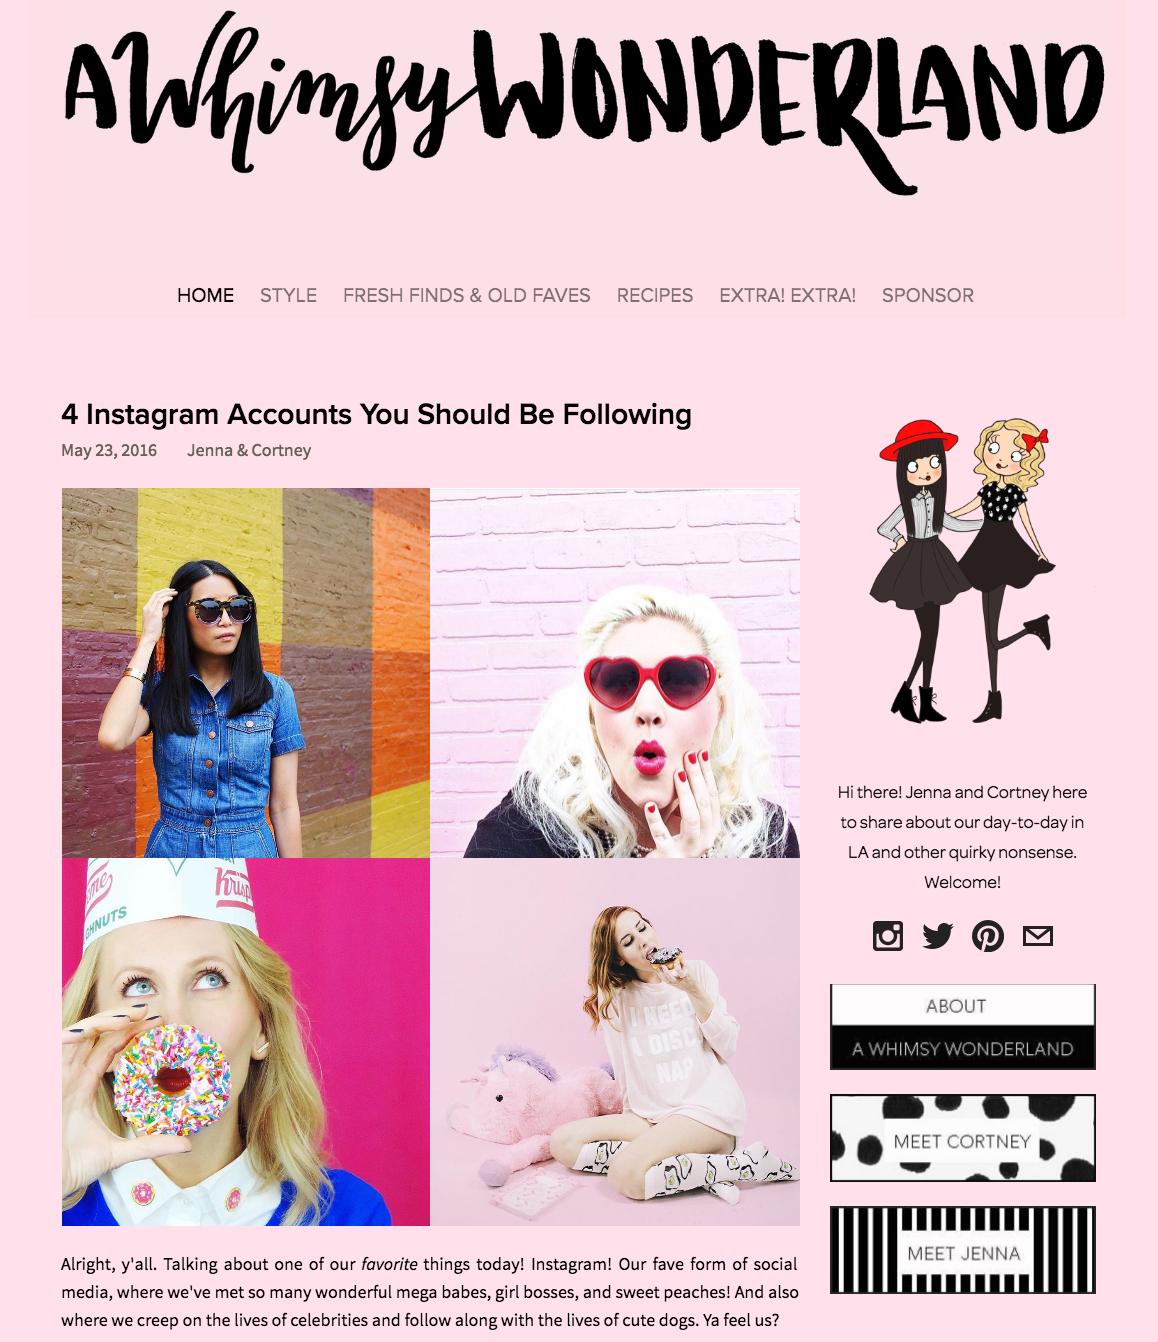 A Whimsy Wonderland